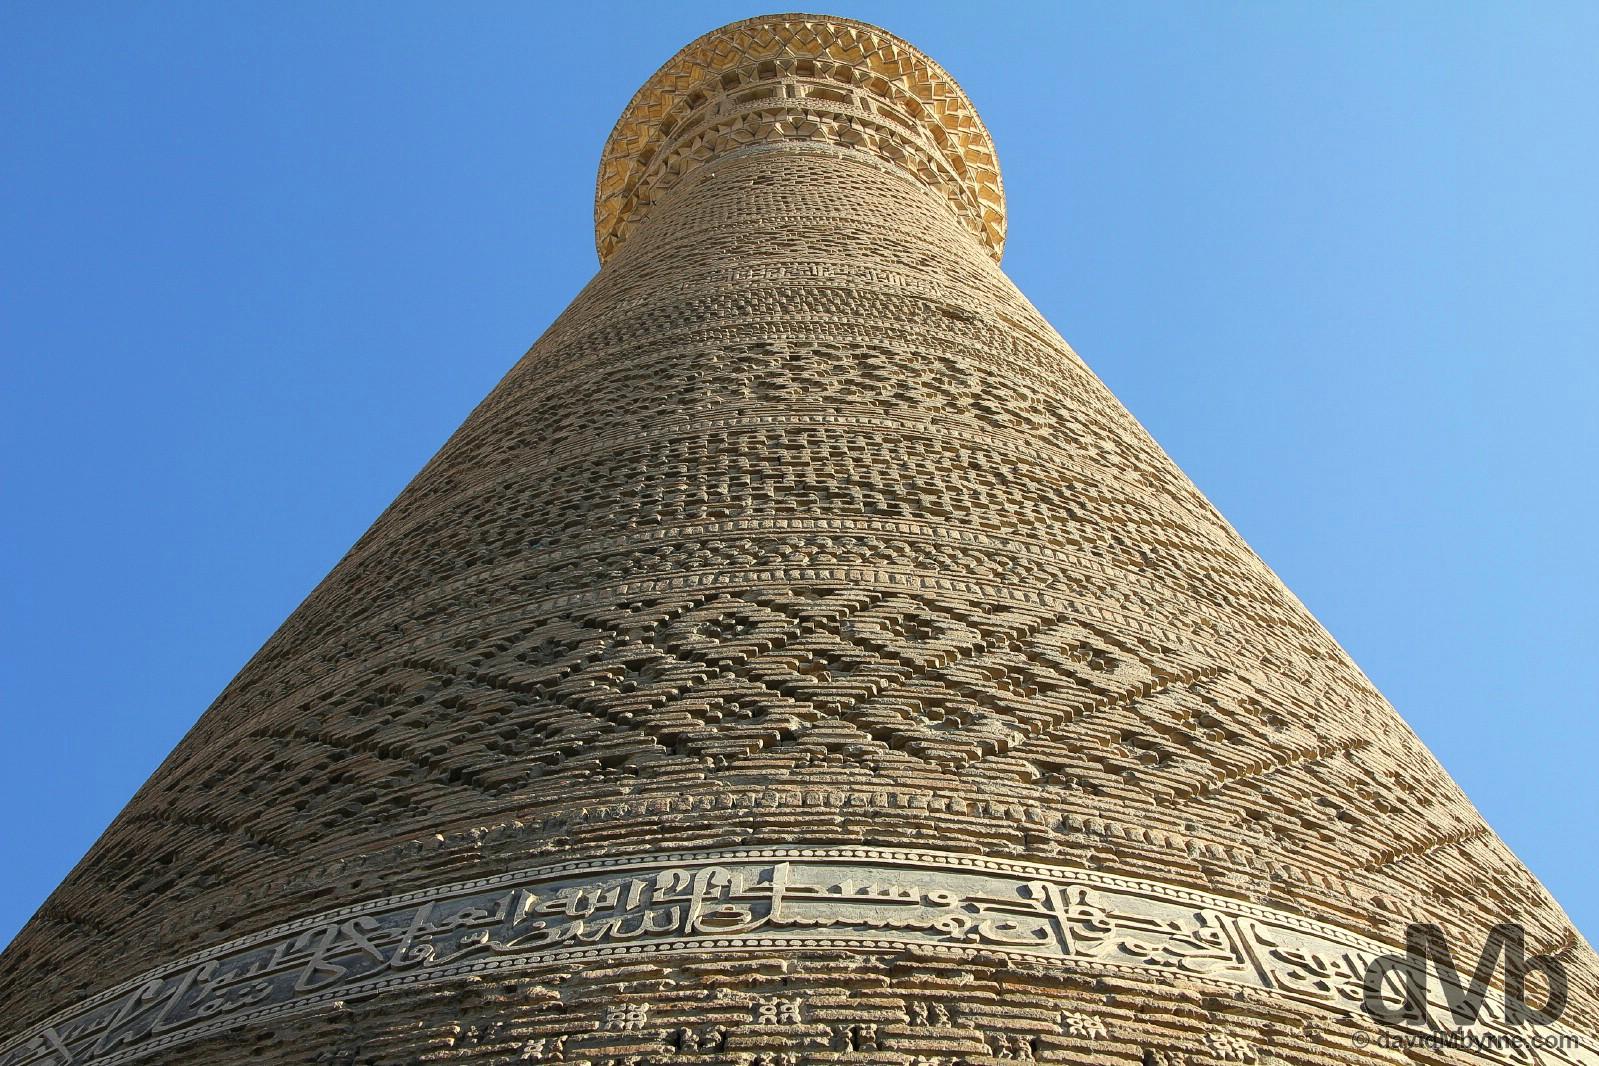 Kalon Minaret in Bukhara, Uzbekistan. March 11, 2015.